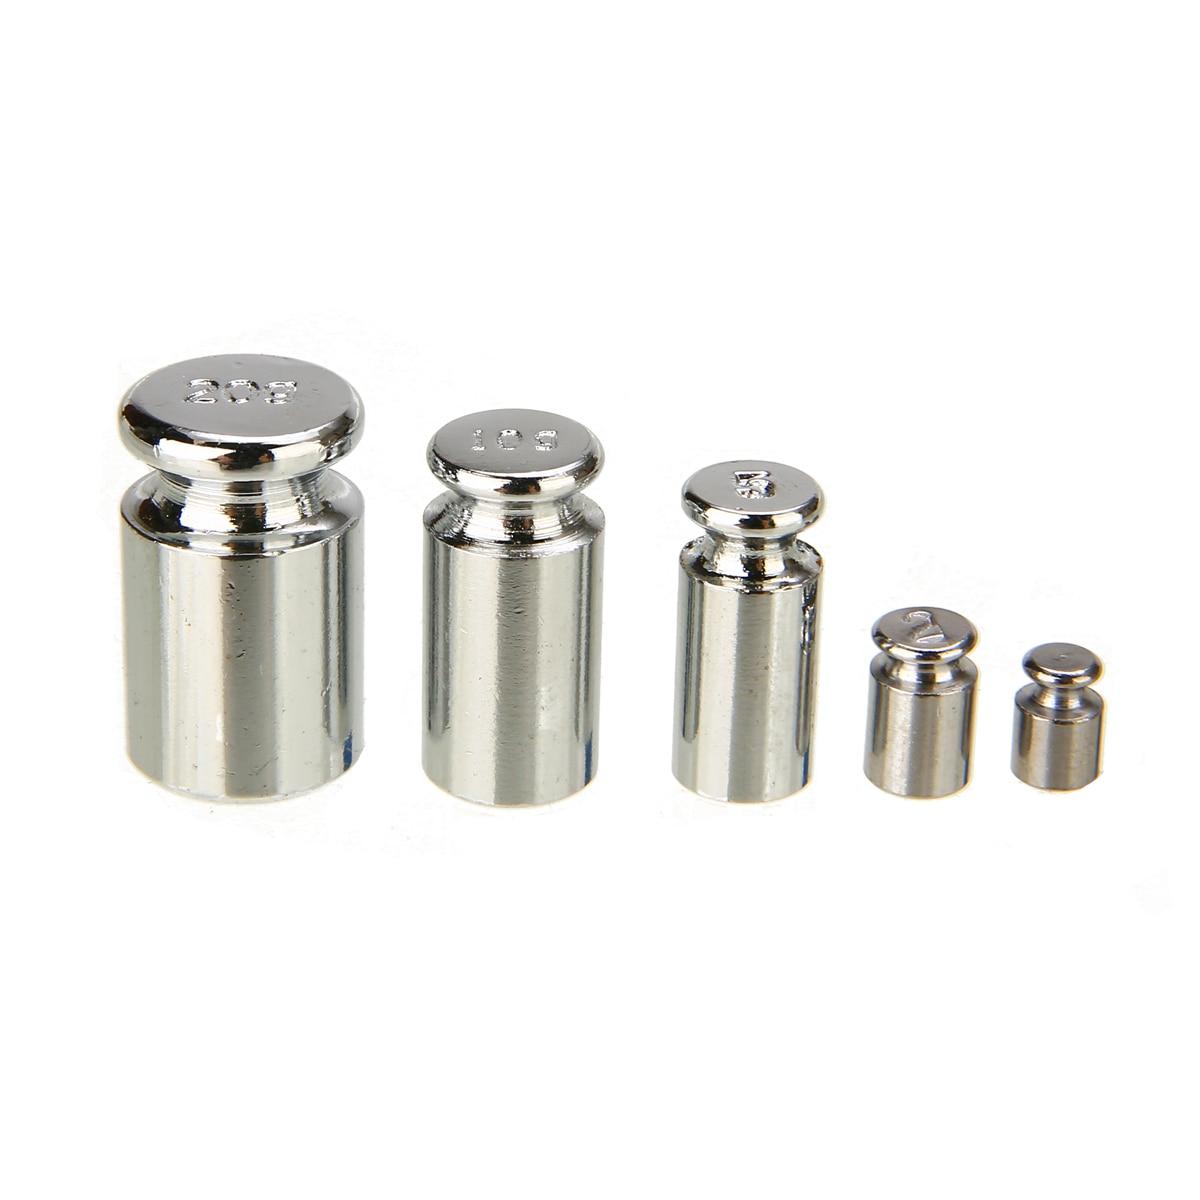 5pcs/set Precision Calibration Set Chrome Plating Scale Weights Set 1g 2g 5g 10g 20g Grams For Home Tool